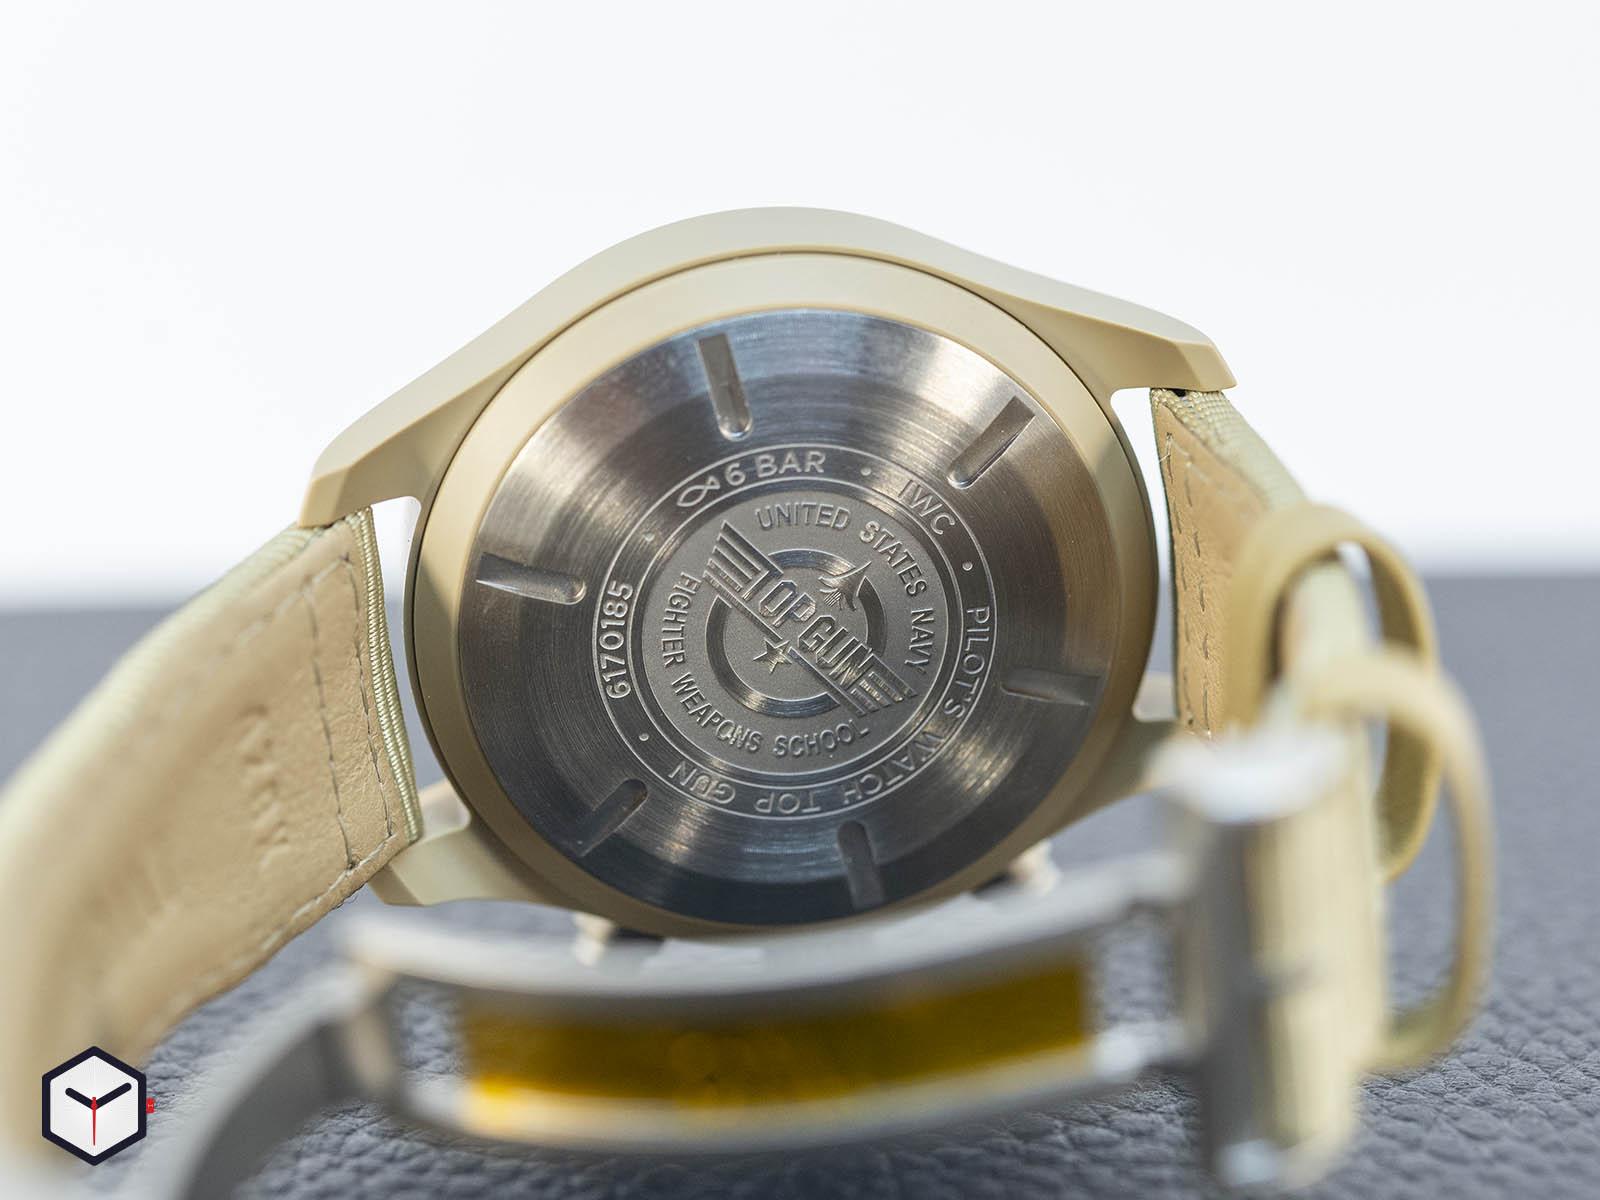 iw389103-iwc-pilot-s-watch-chronograph-top-gun-edition-mojave-desert-sihh-2019-5.jpg